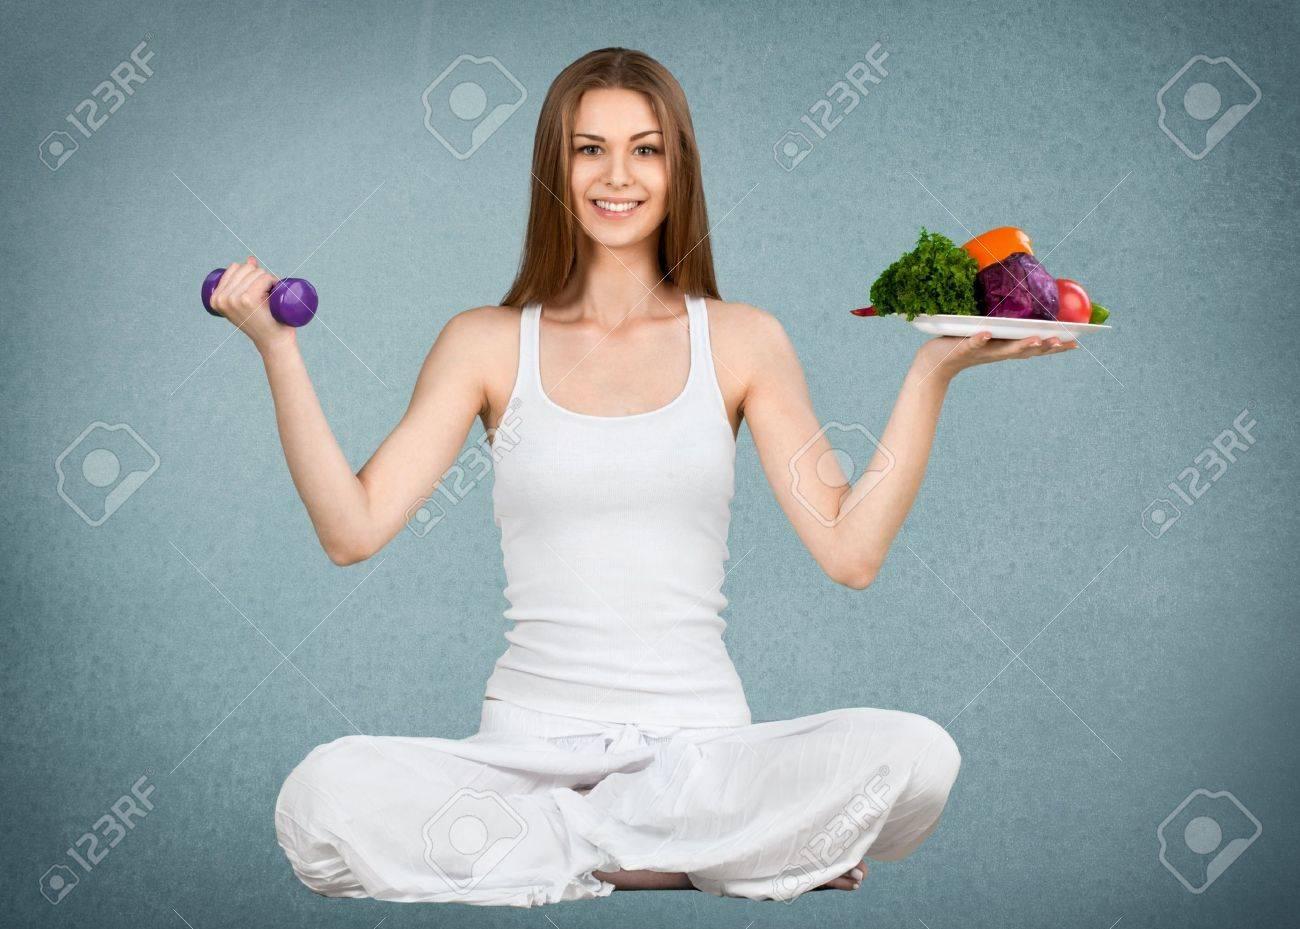 Exercising. - 43836136